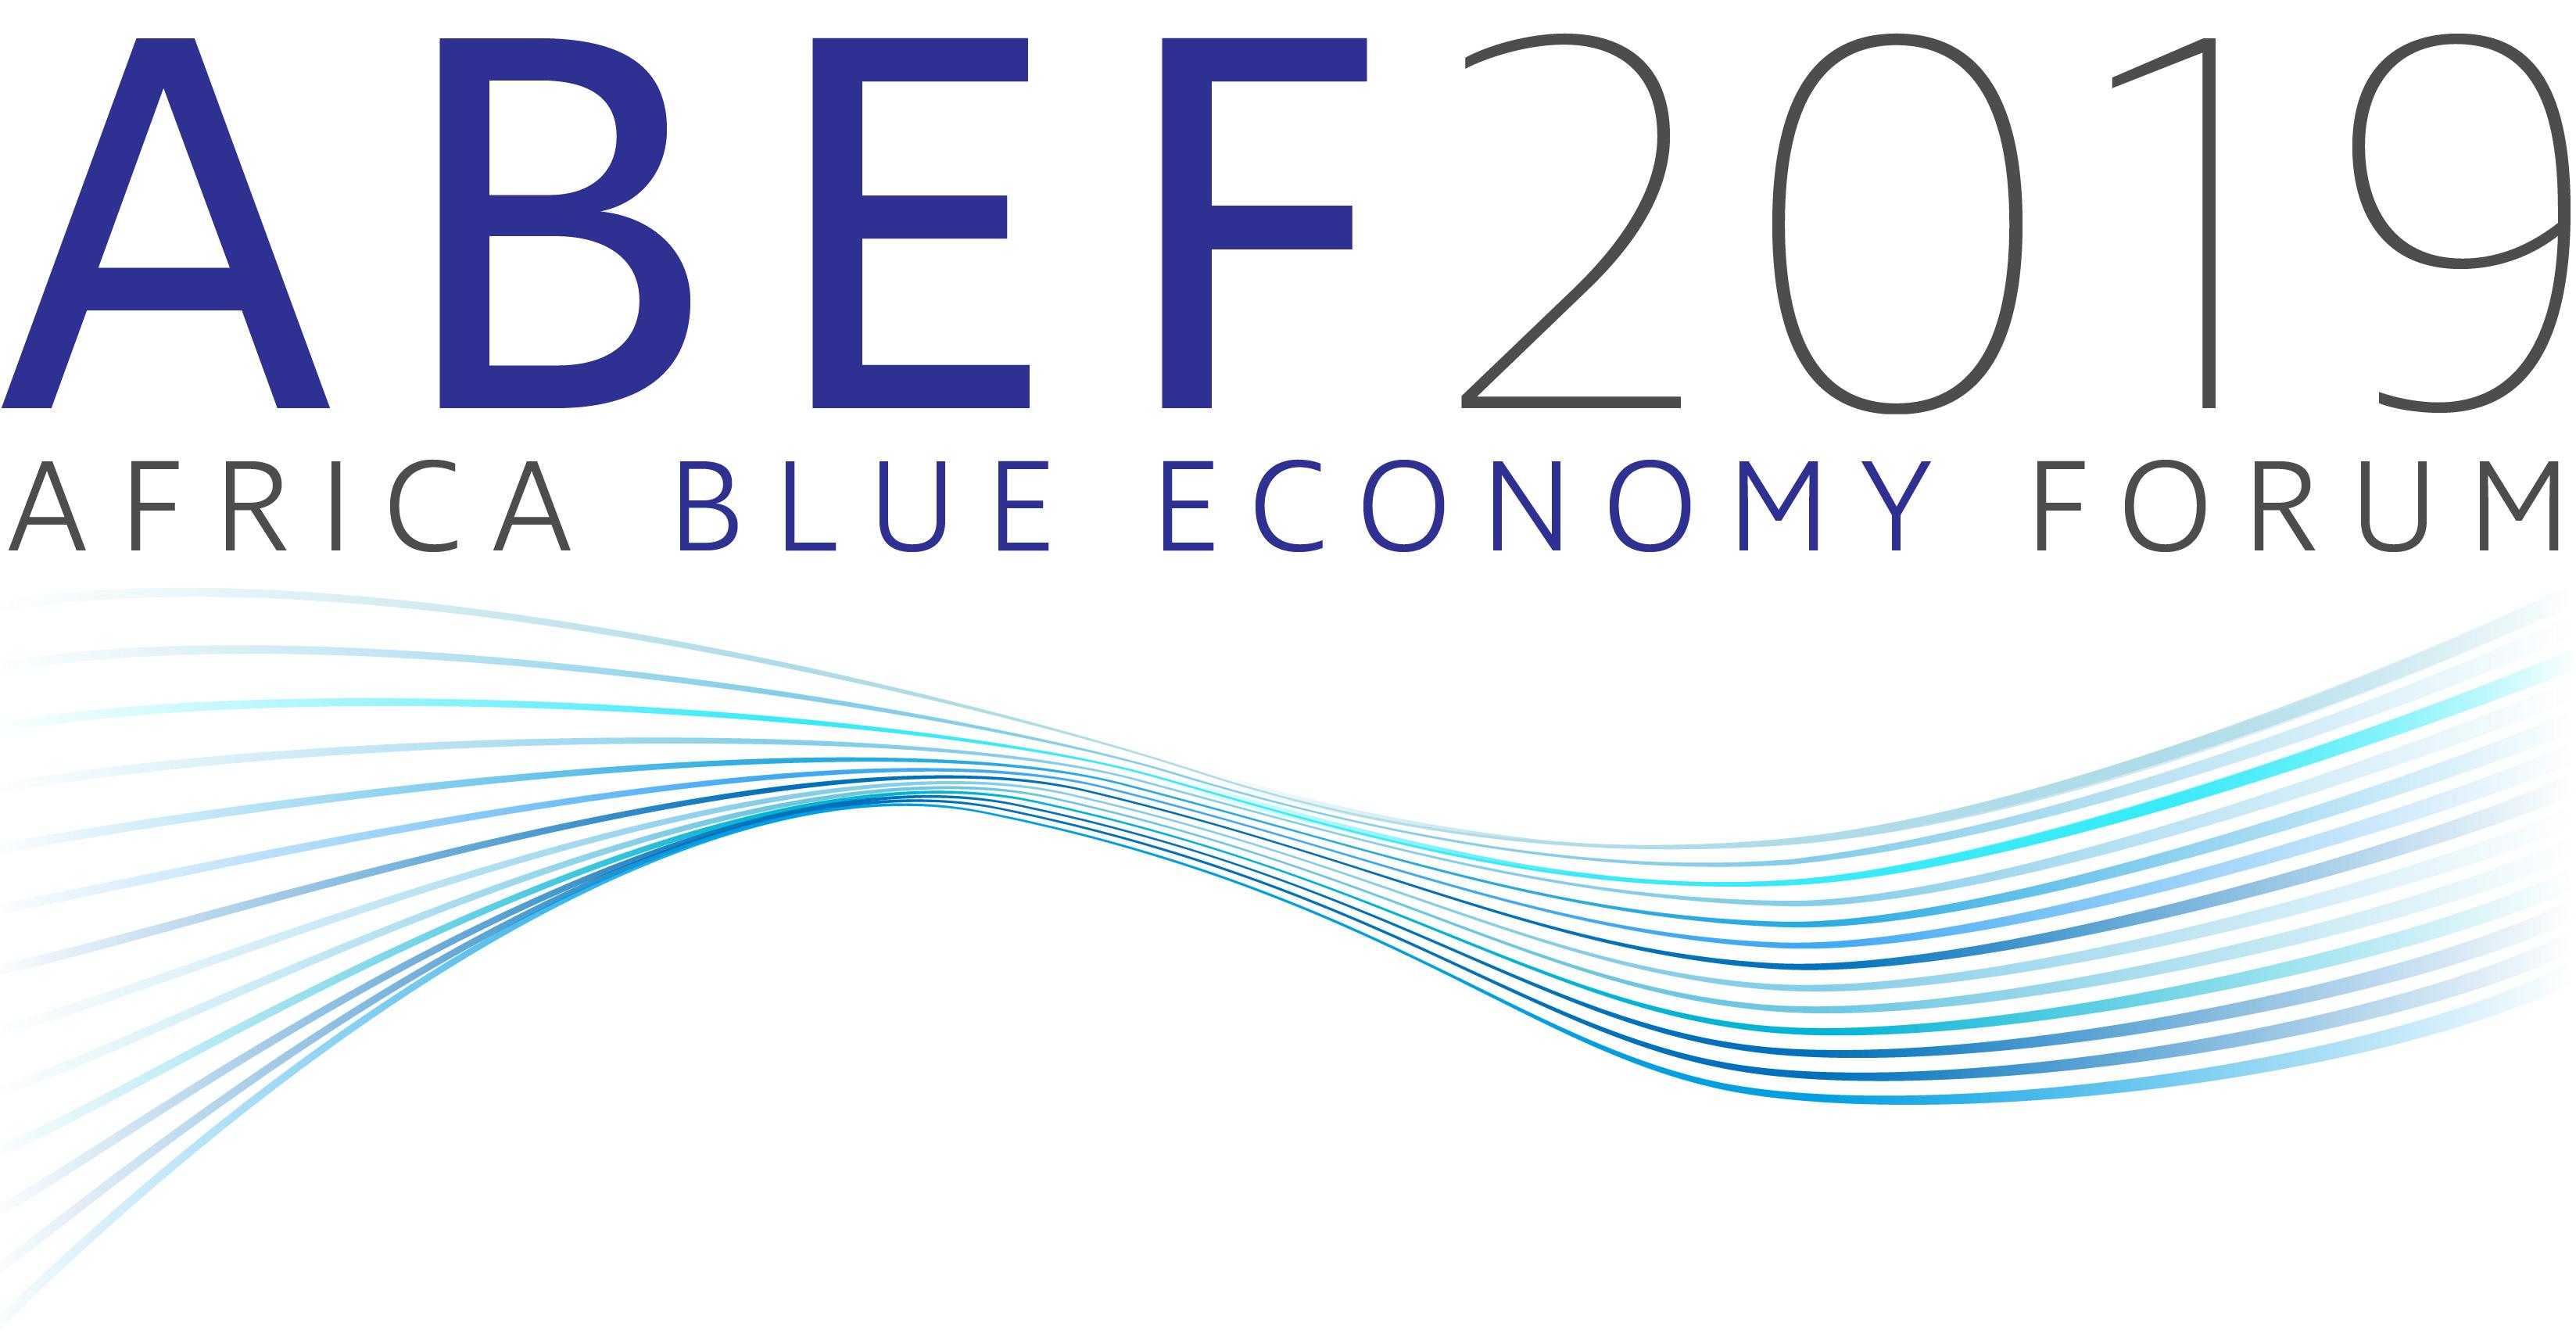 Africa Blue Economy Forum (ABEF)